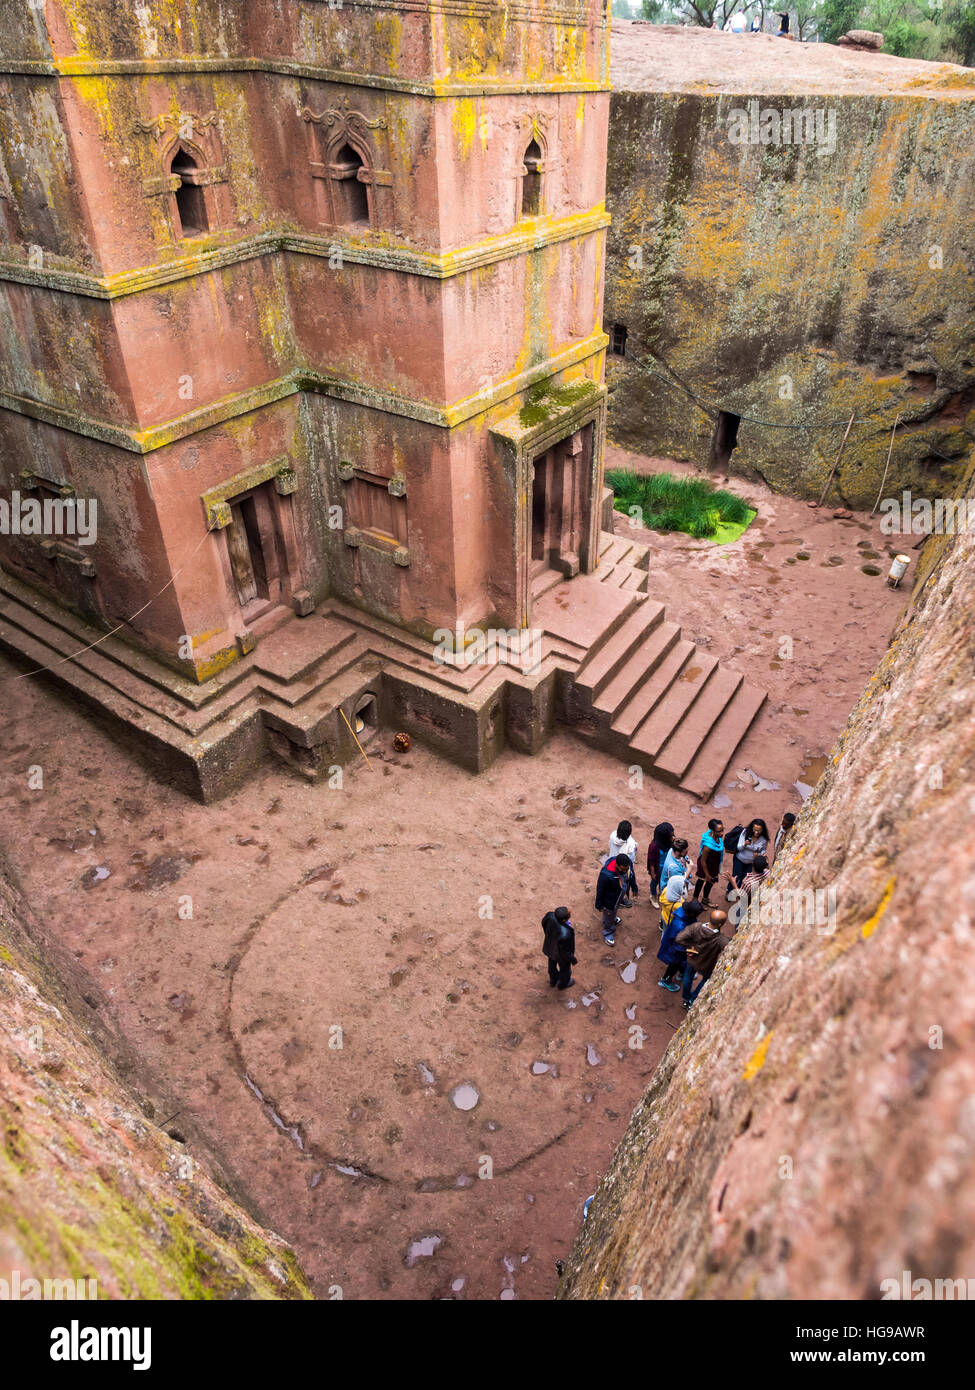 Church of Saint George (Bete Giyorgis), Lalibela, Ethiopia. Wide angle. - Stock Image